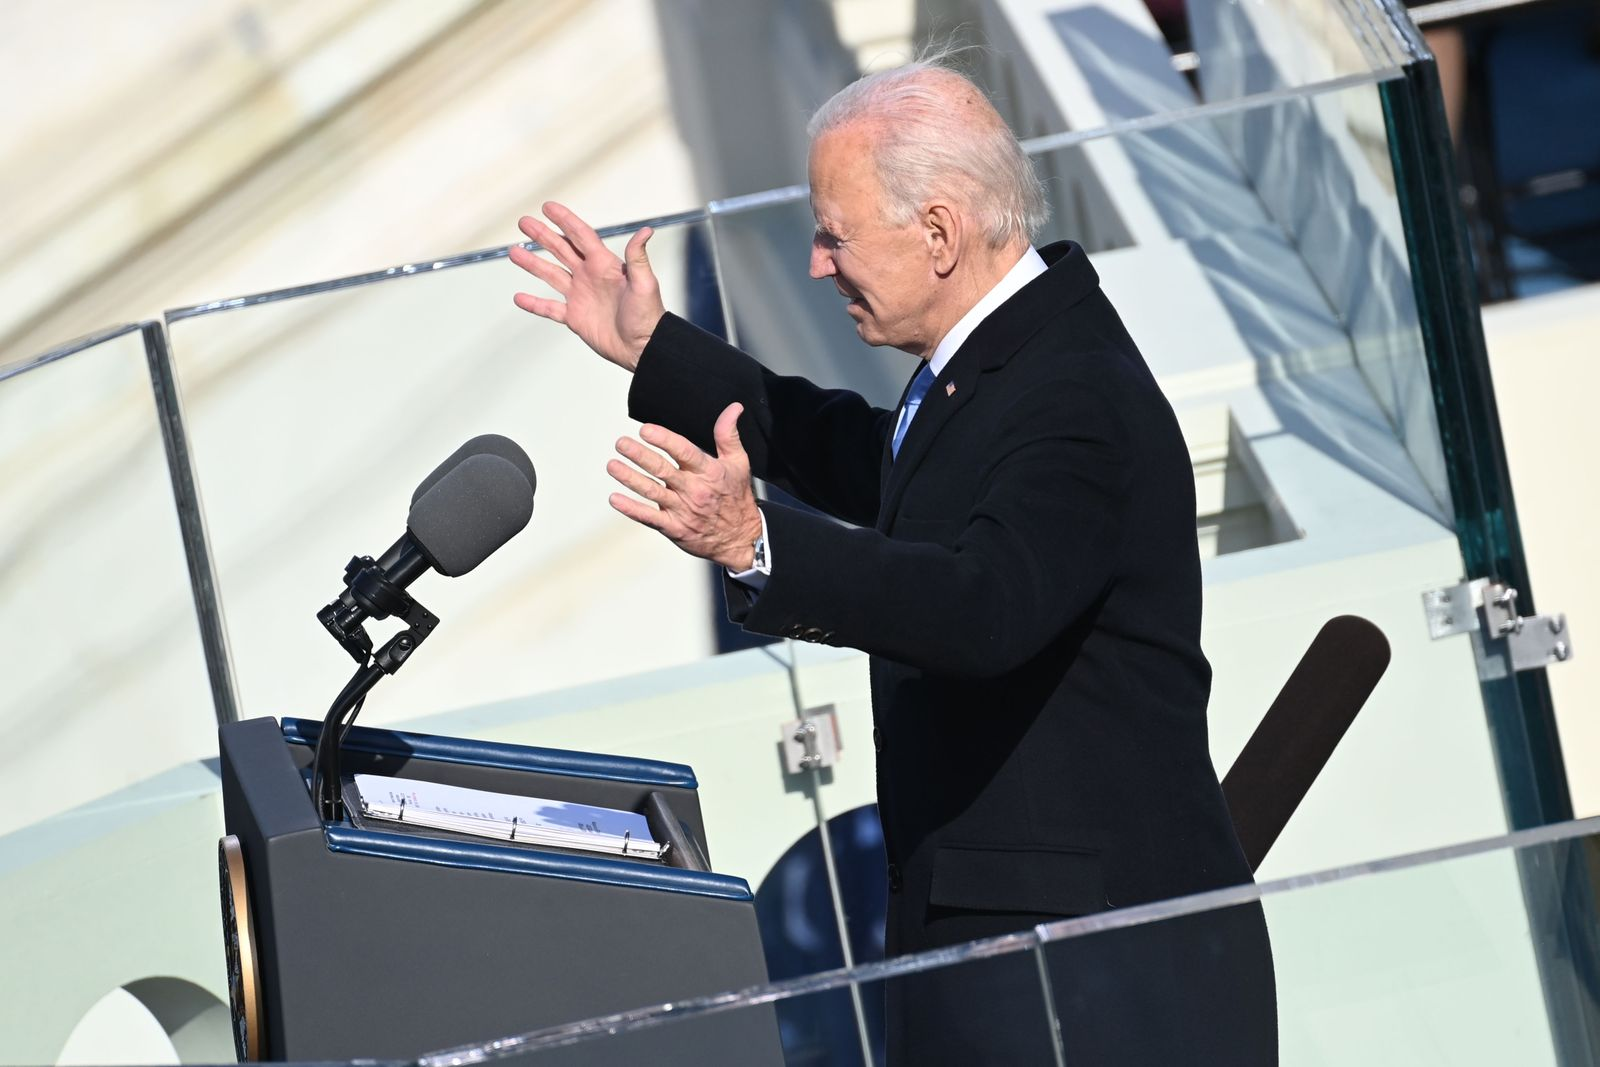 US Presidential inauguration 2021, Washington, USA - 20 Jan 2021